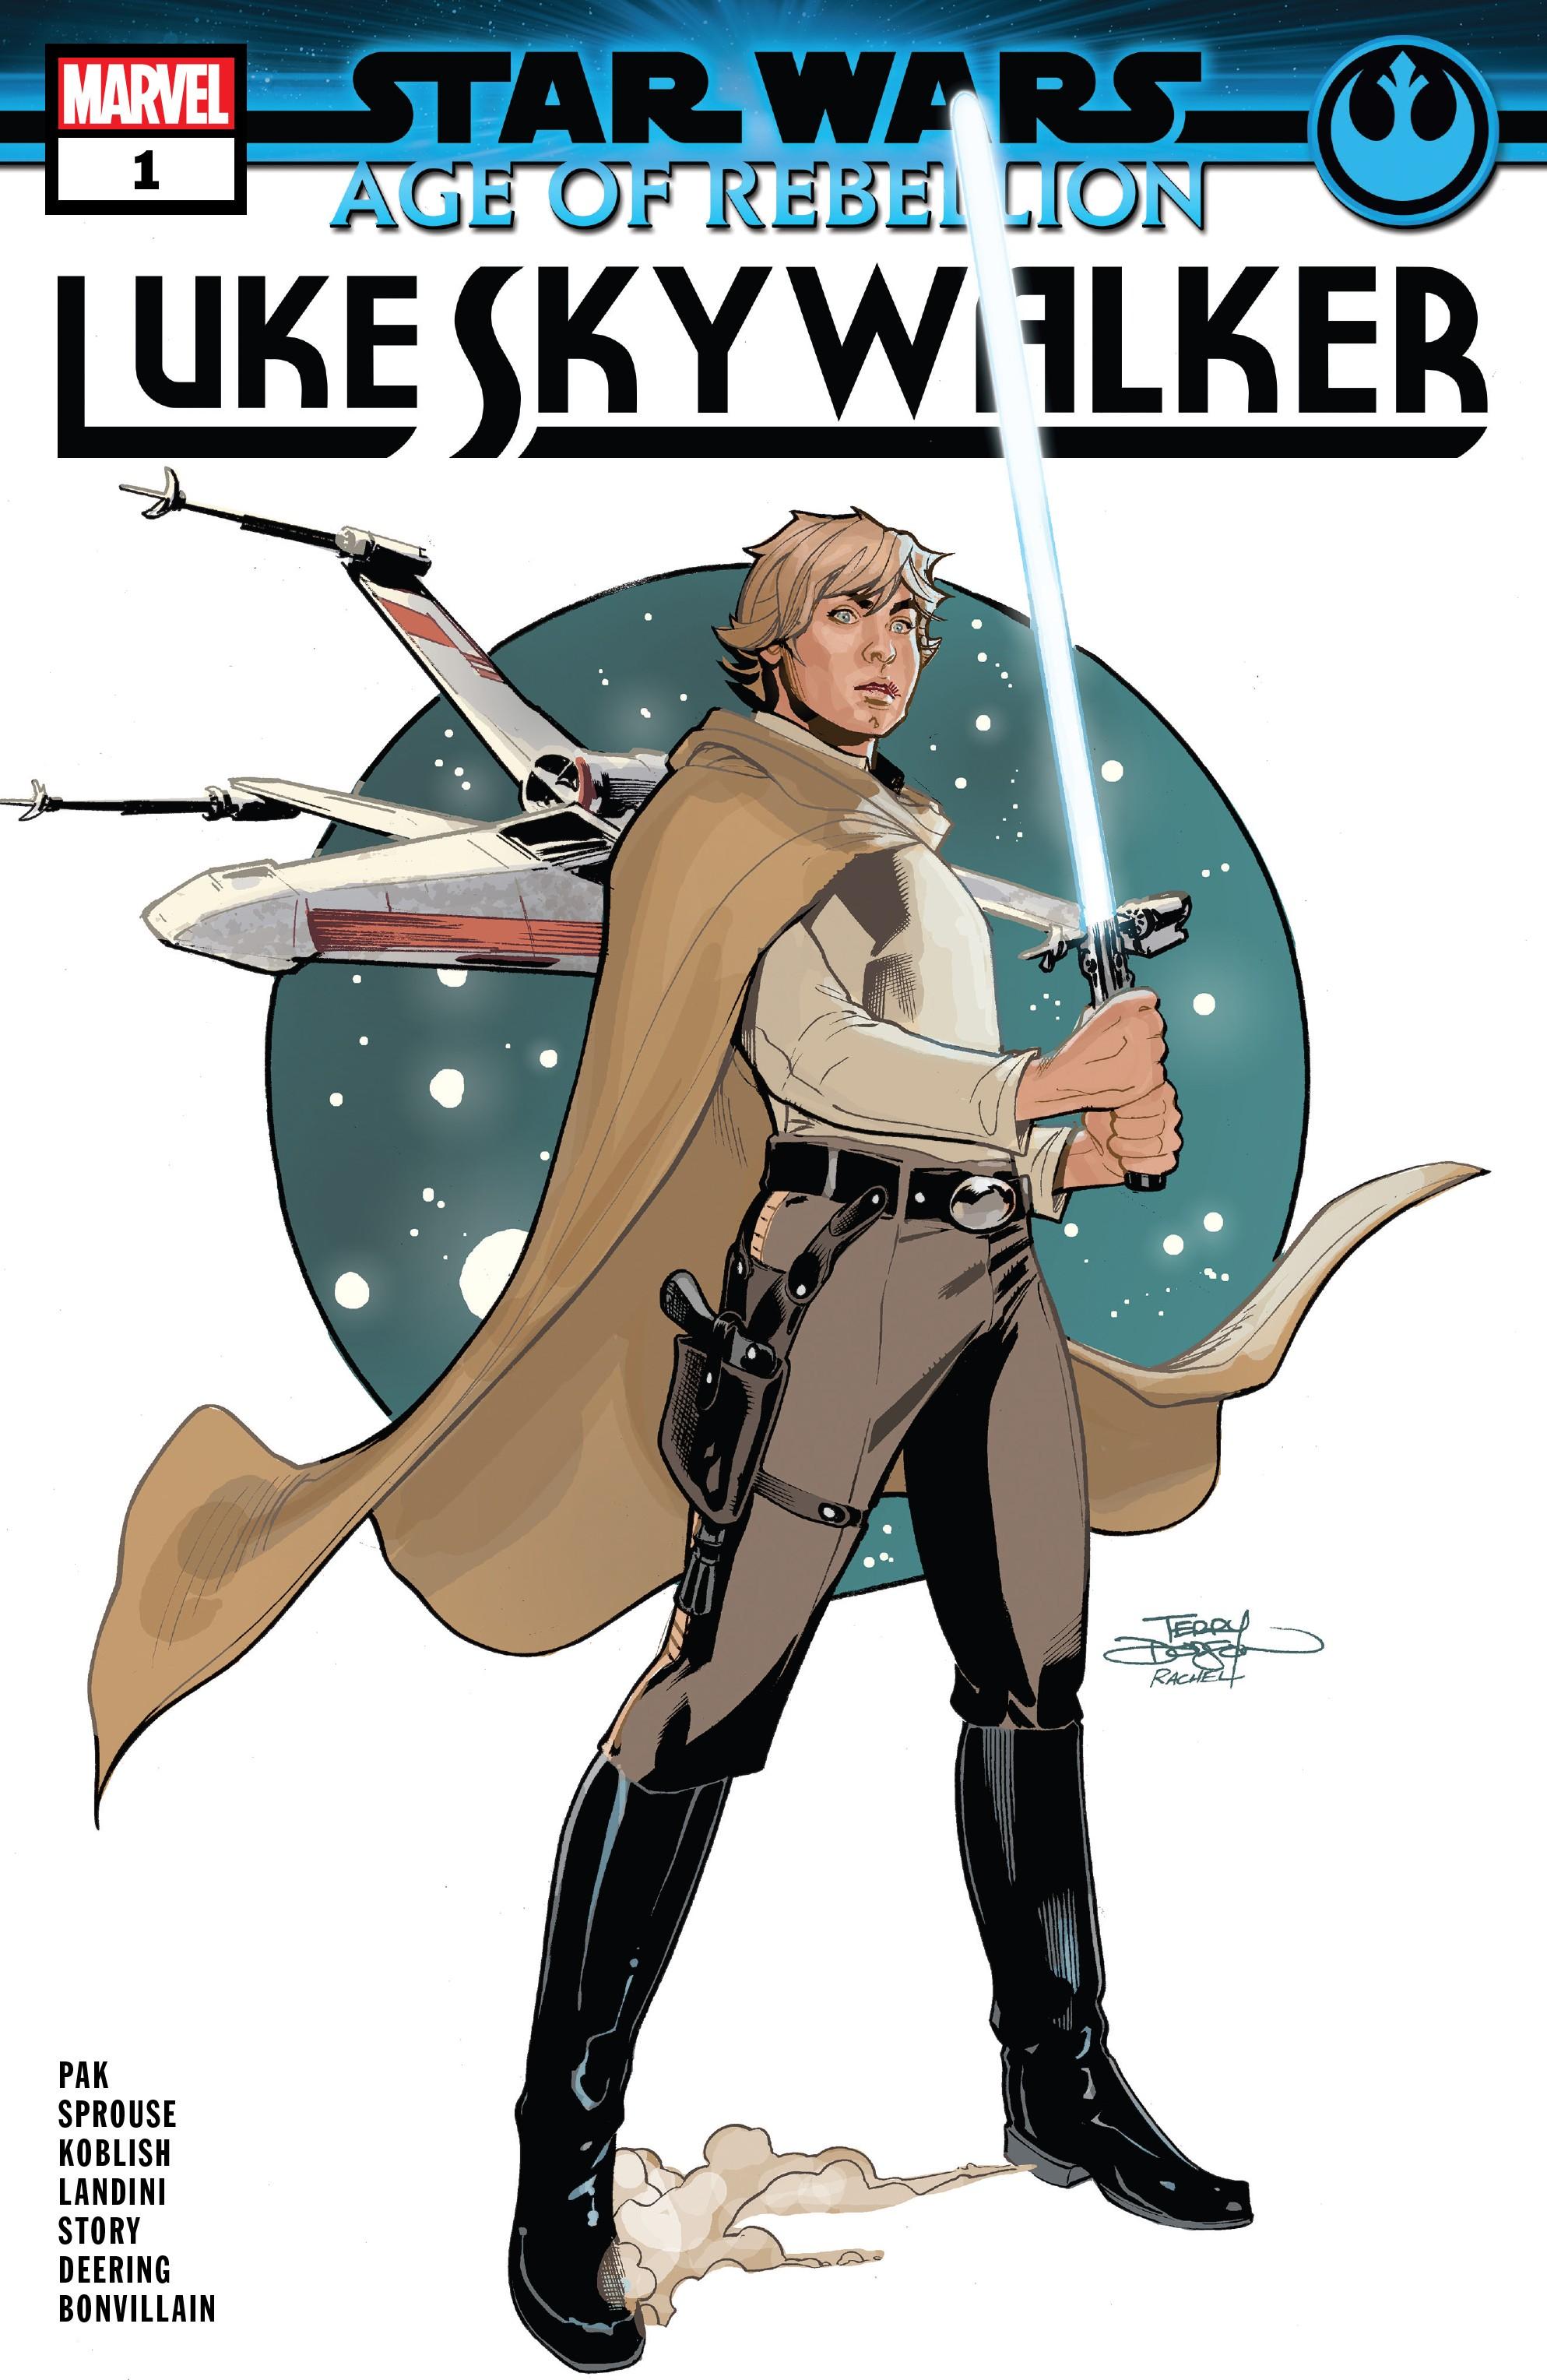 Age of Rebellion - Luke Skywalker #1